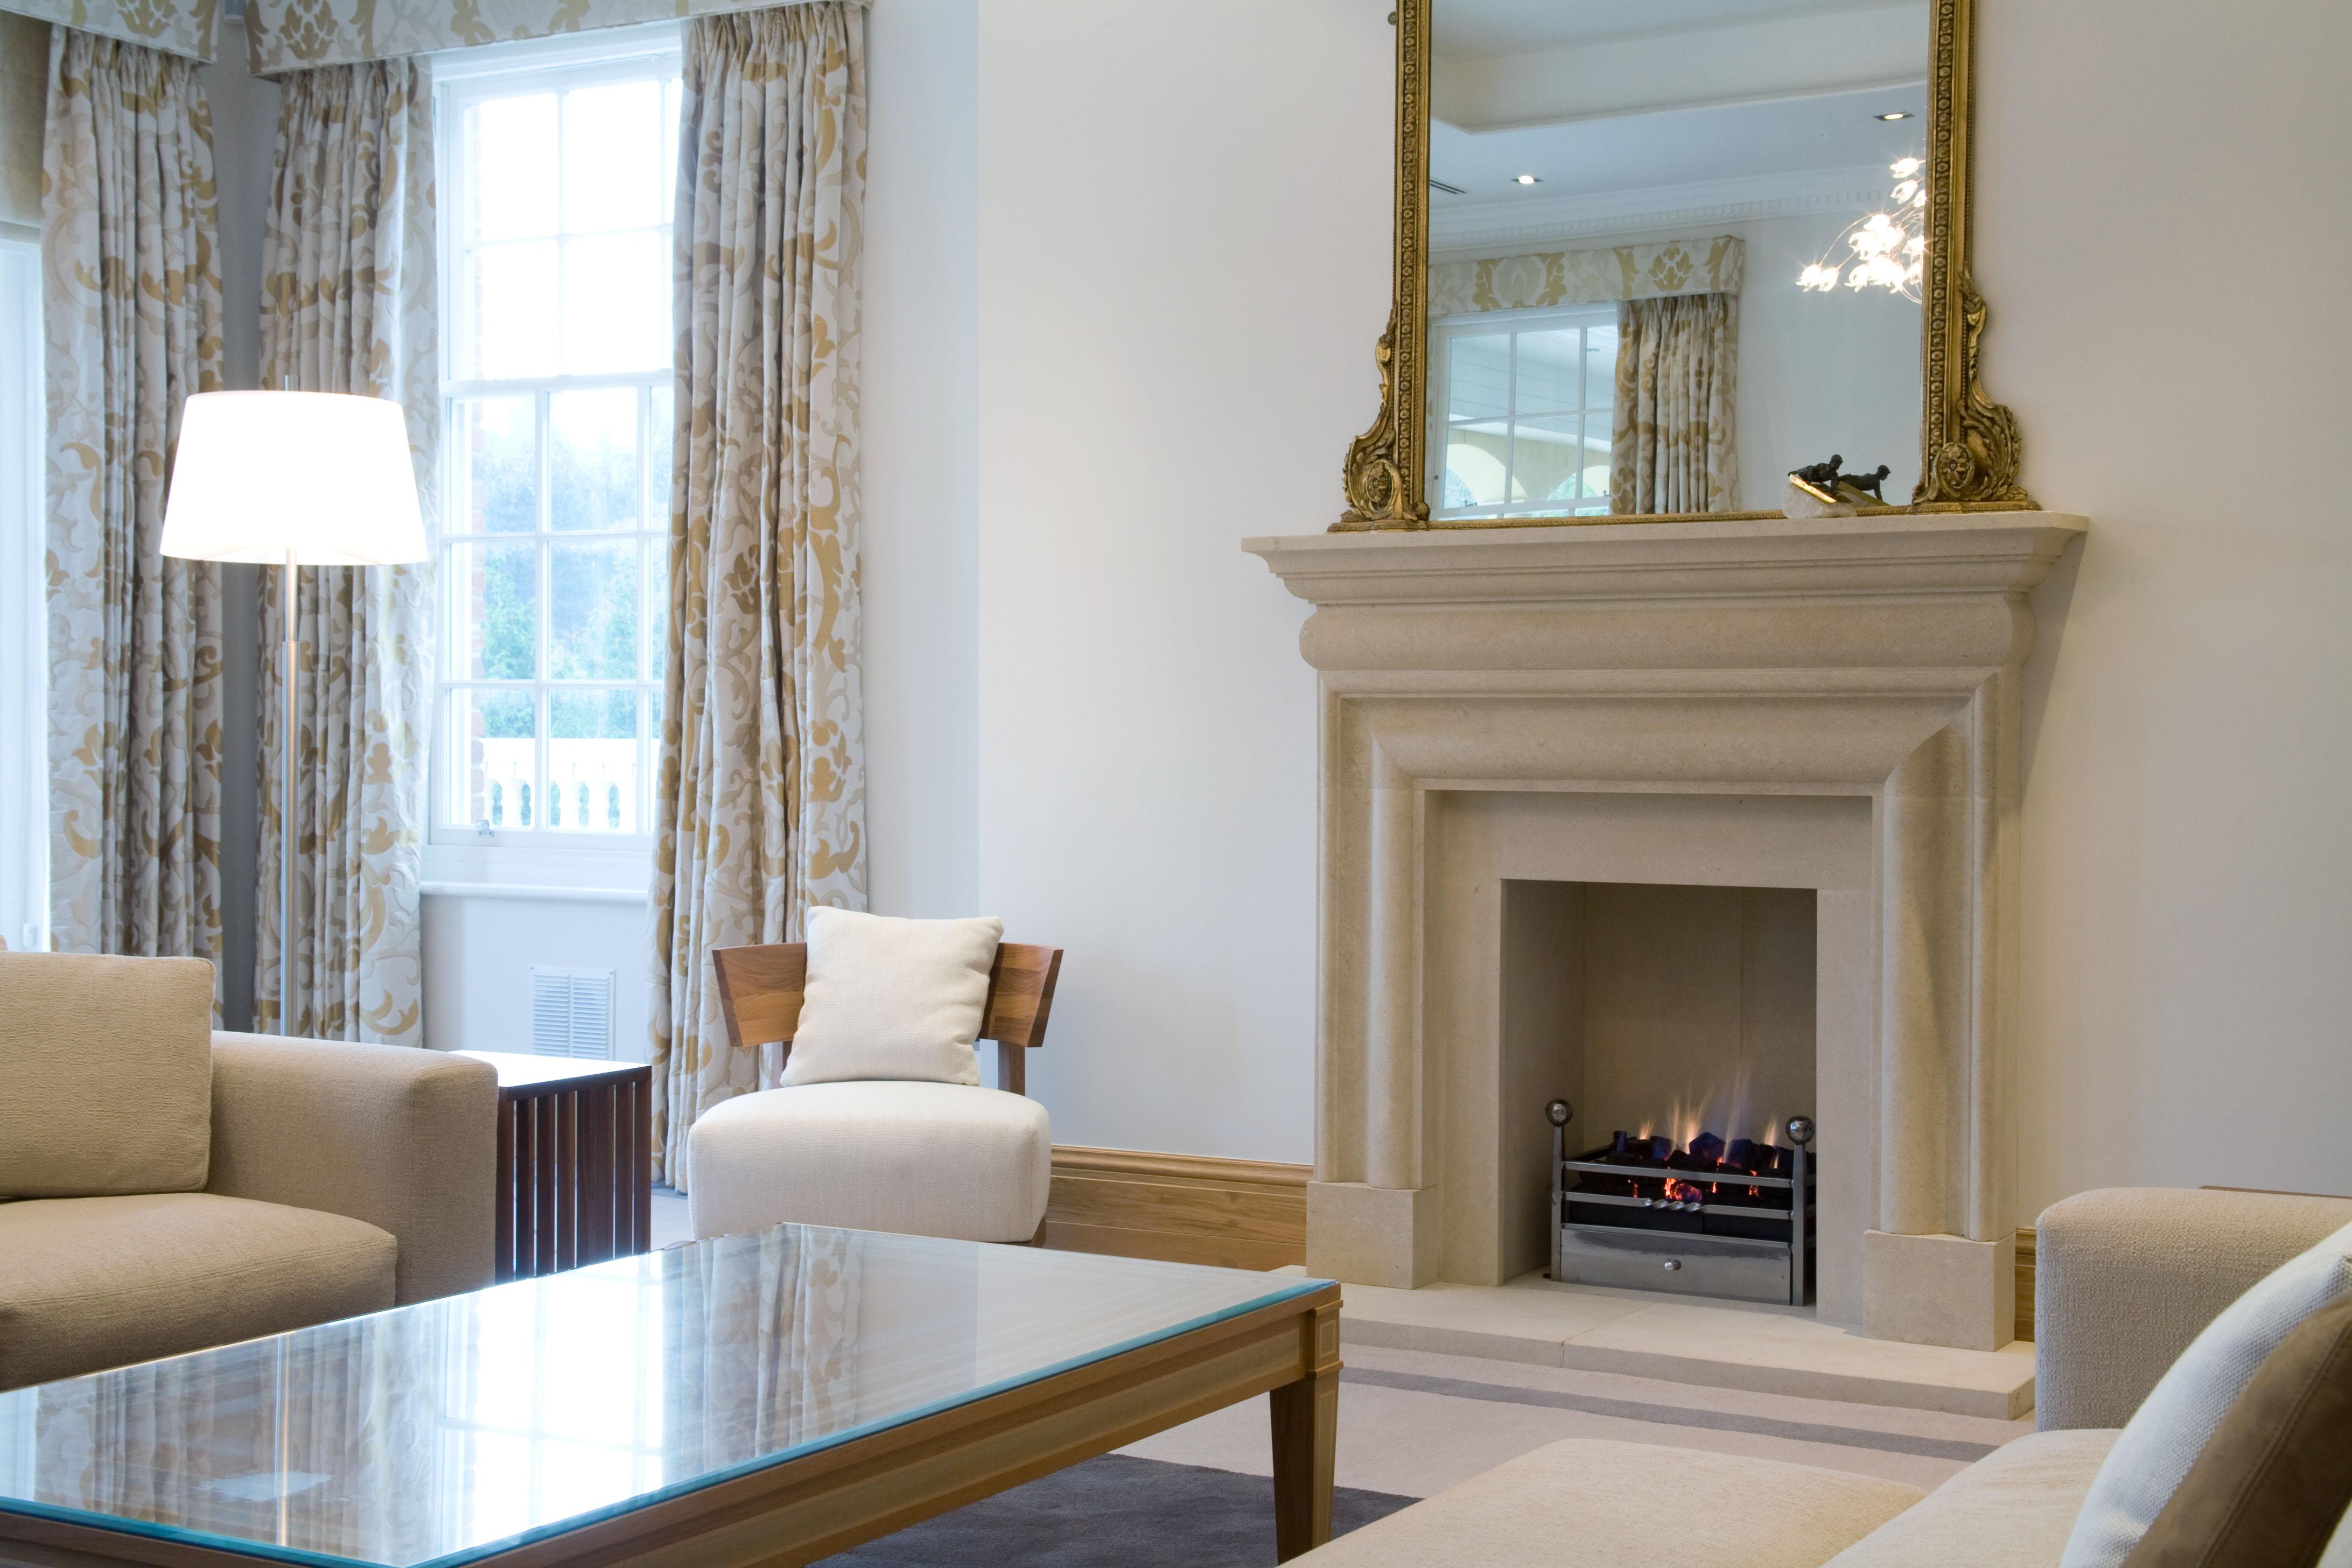 pinckney green fireplaces hand carve elegant natural stone